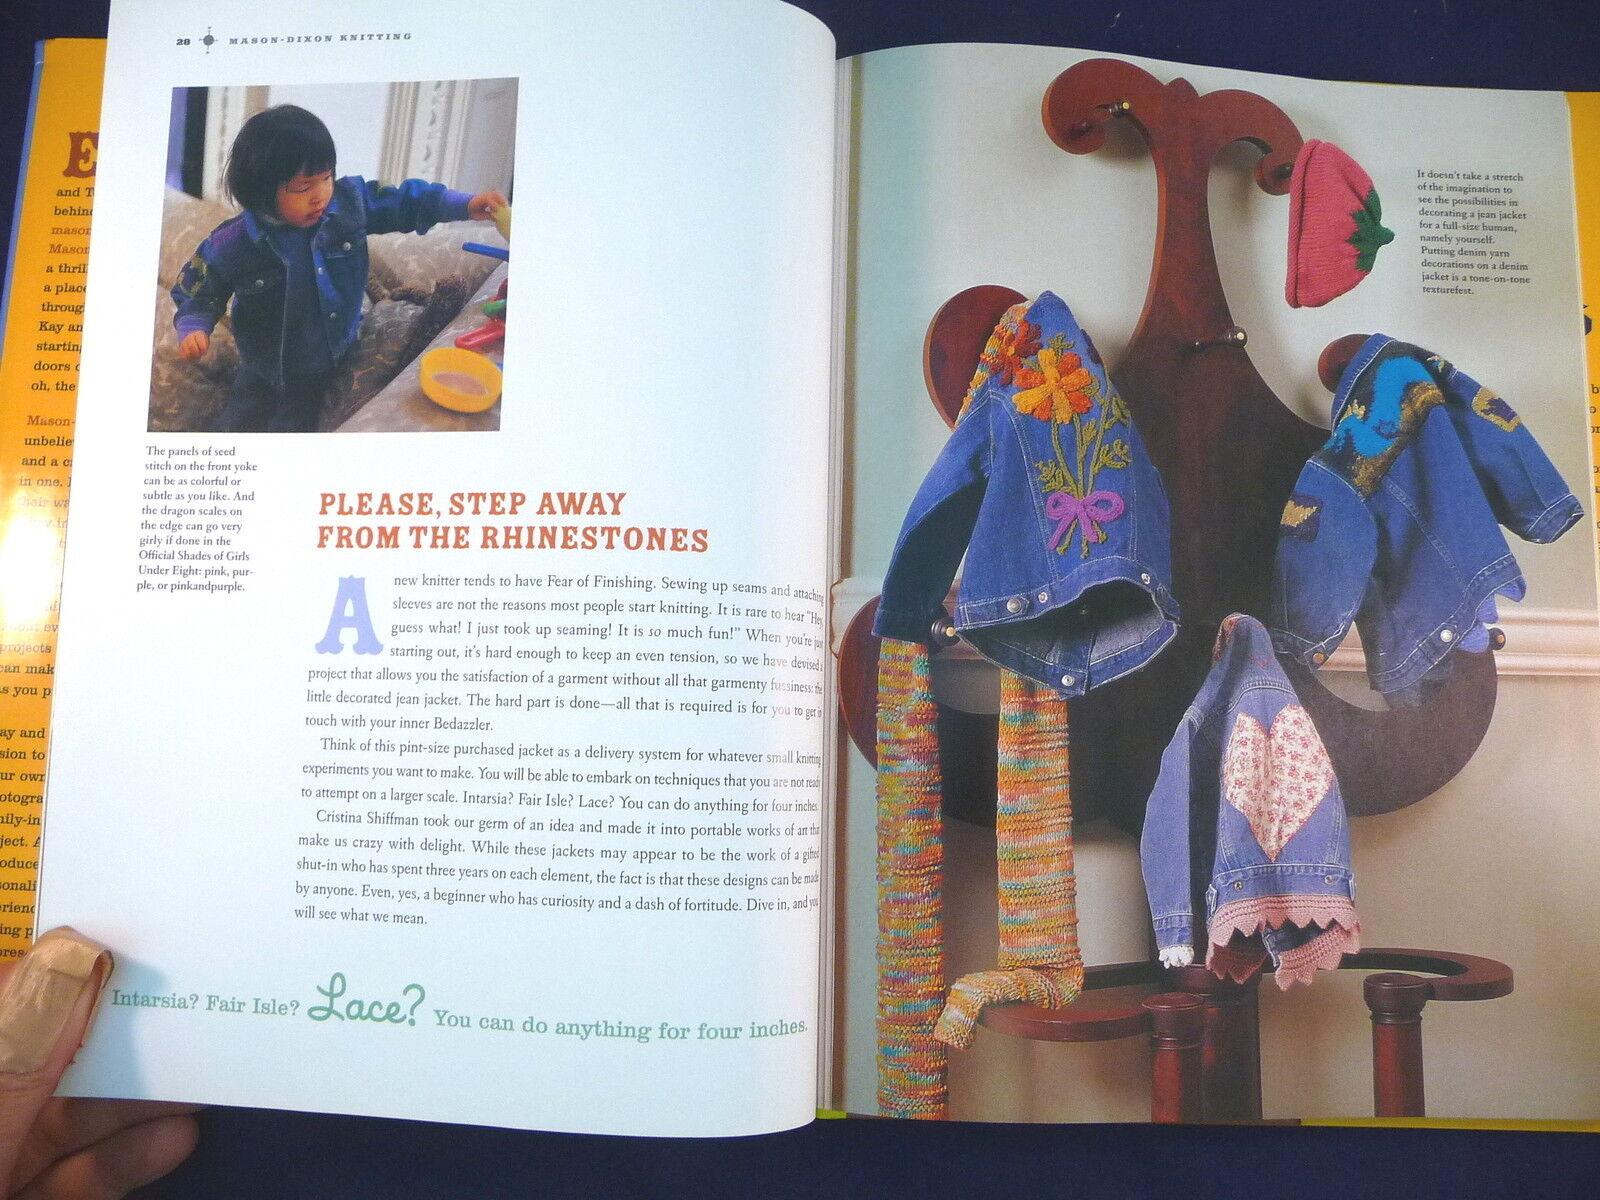 2b9fdc50a386 Mason dixon knitting the curious knitters guide stories jpg 1600x1200 Books  mason dixon tricky patterns